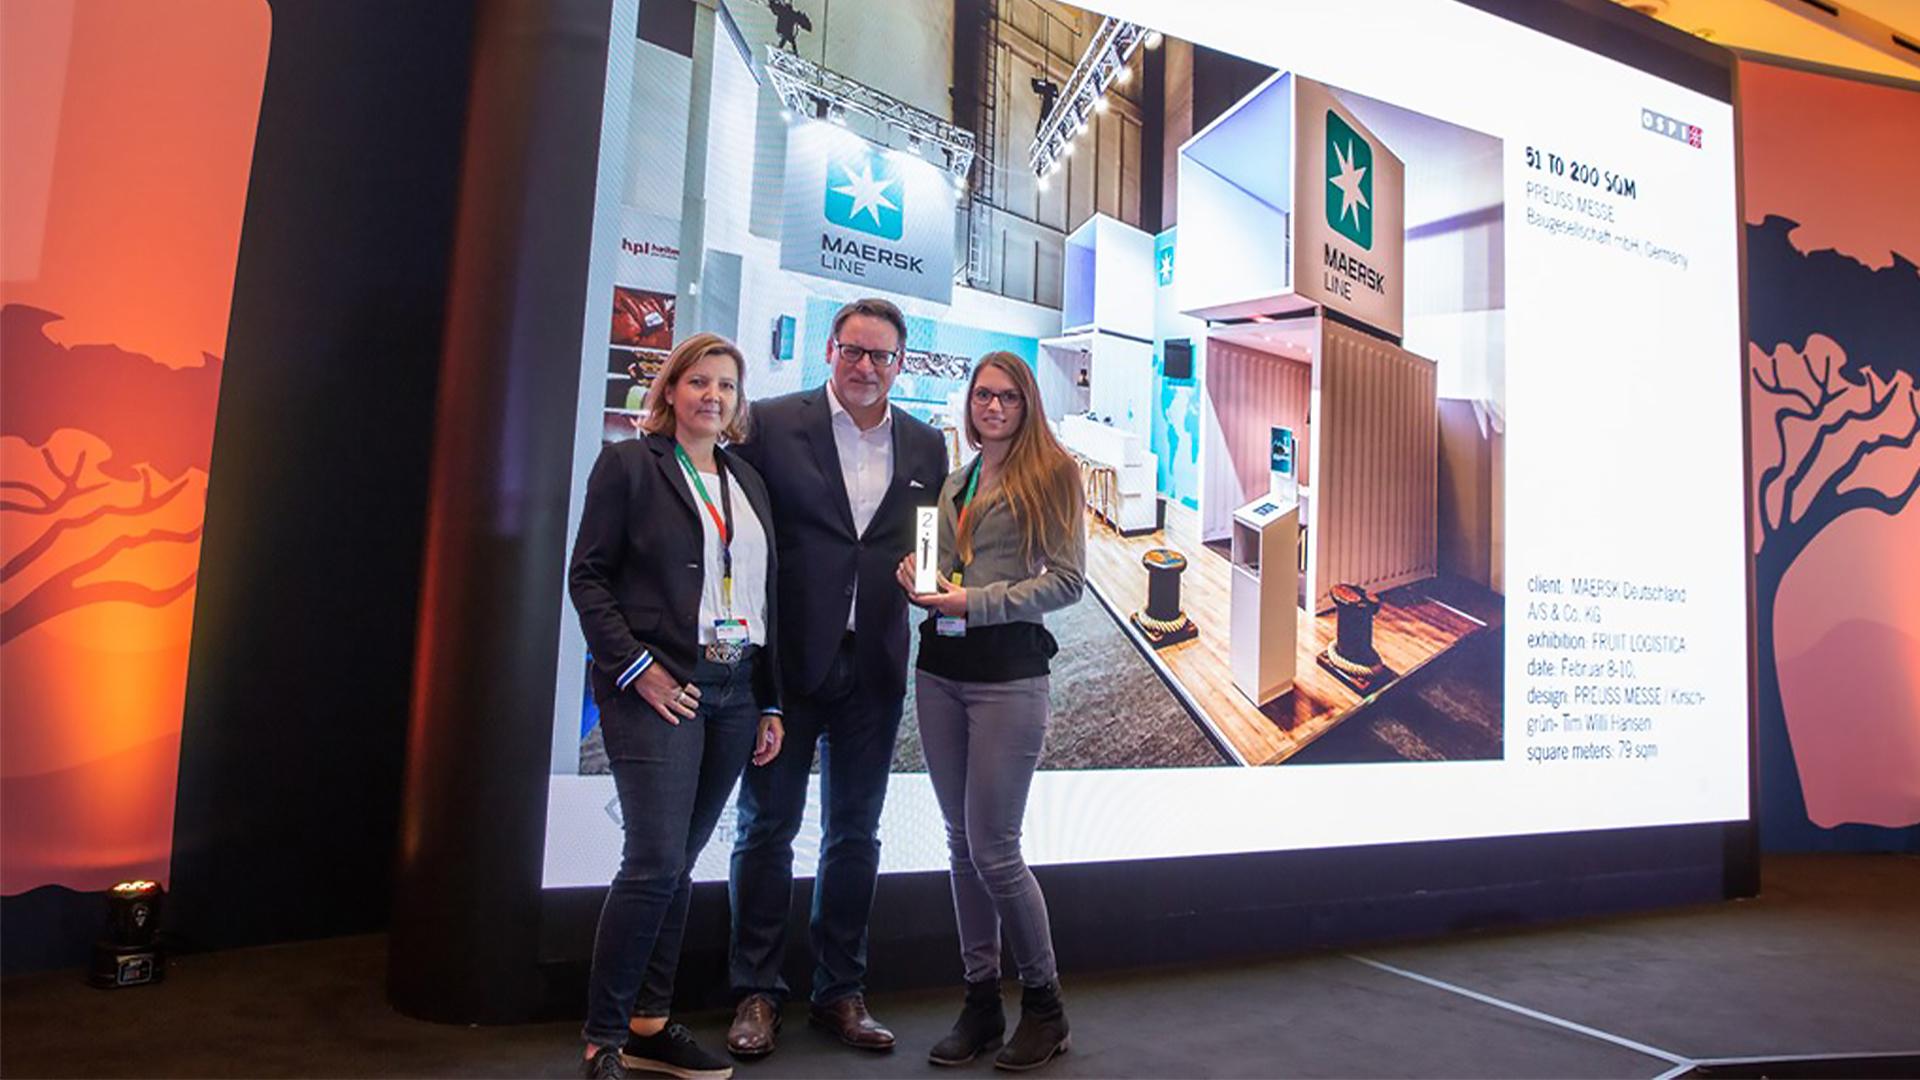 PREUSS MESSE OSPI Award Preisübergabe 2018 Kapstadt